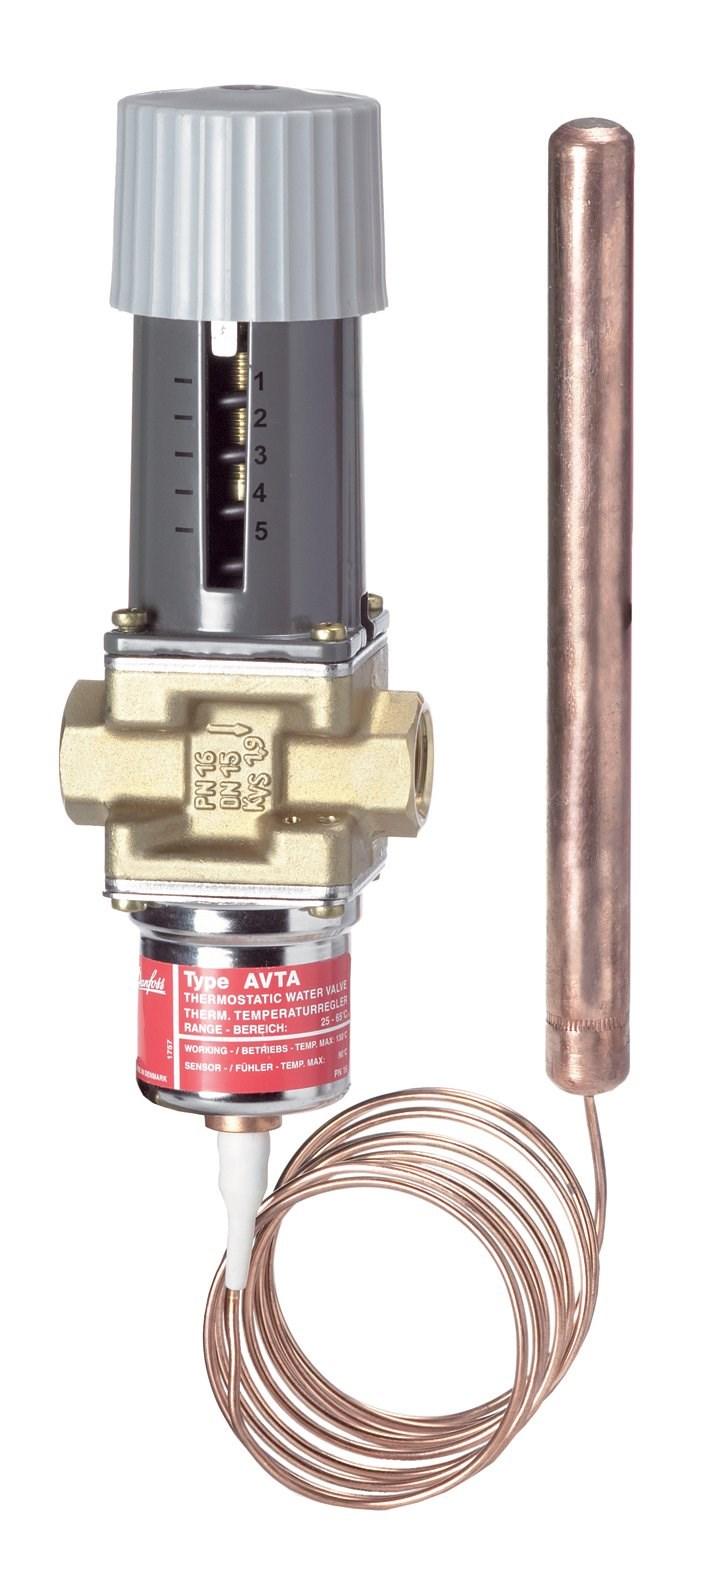 Avta Thermostatic Valves With Temperature Sensitive Sensor Visuals